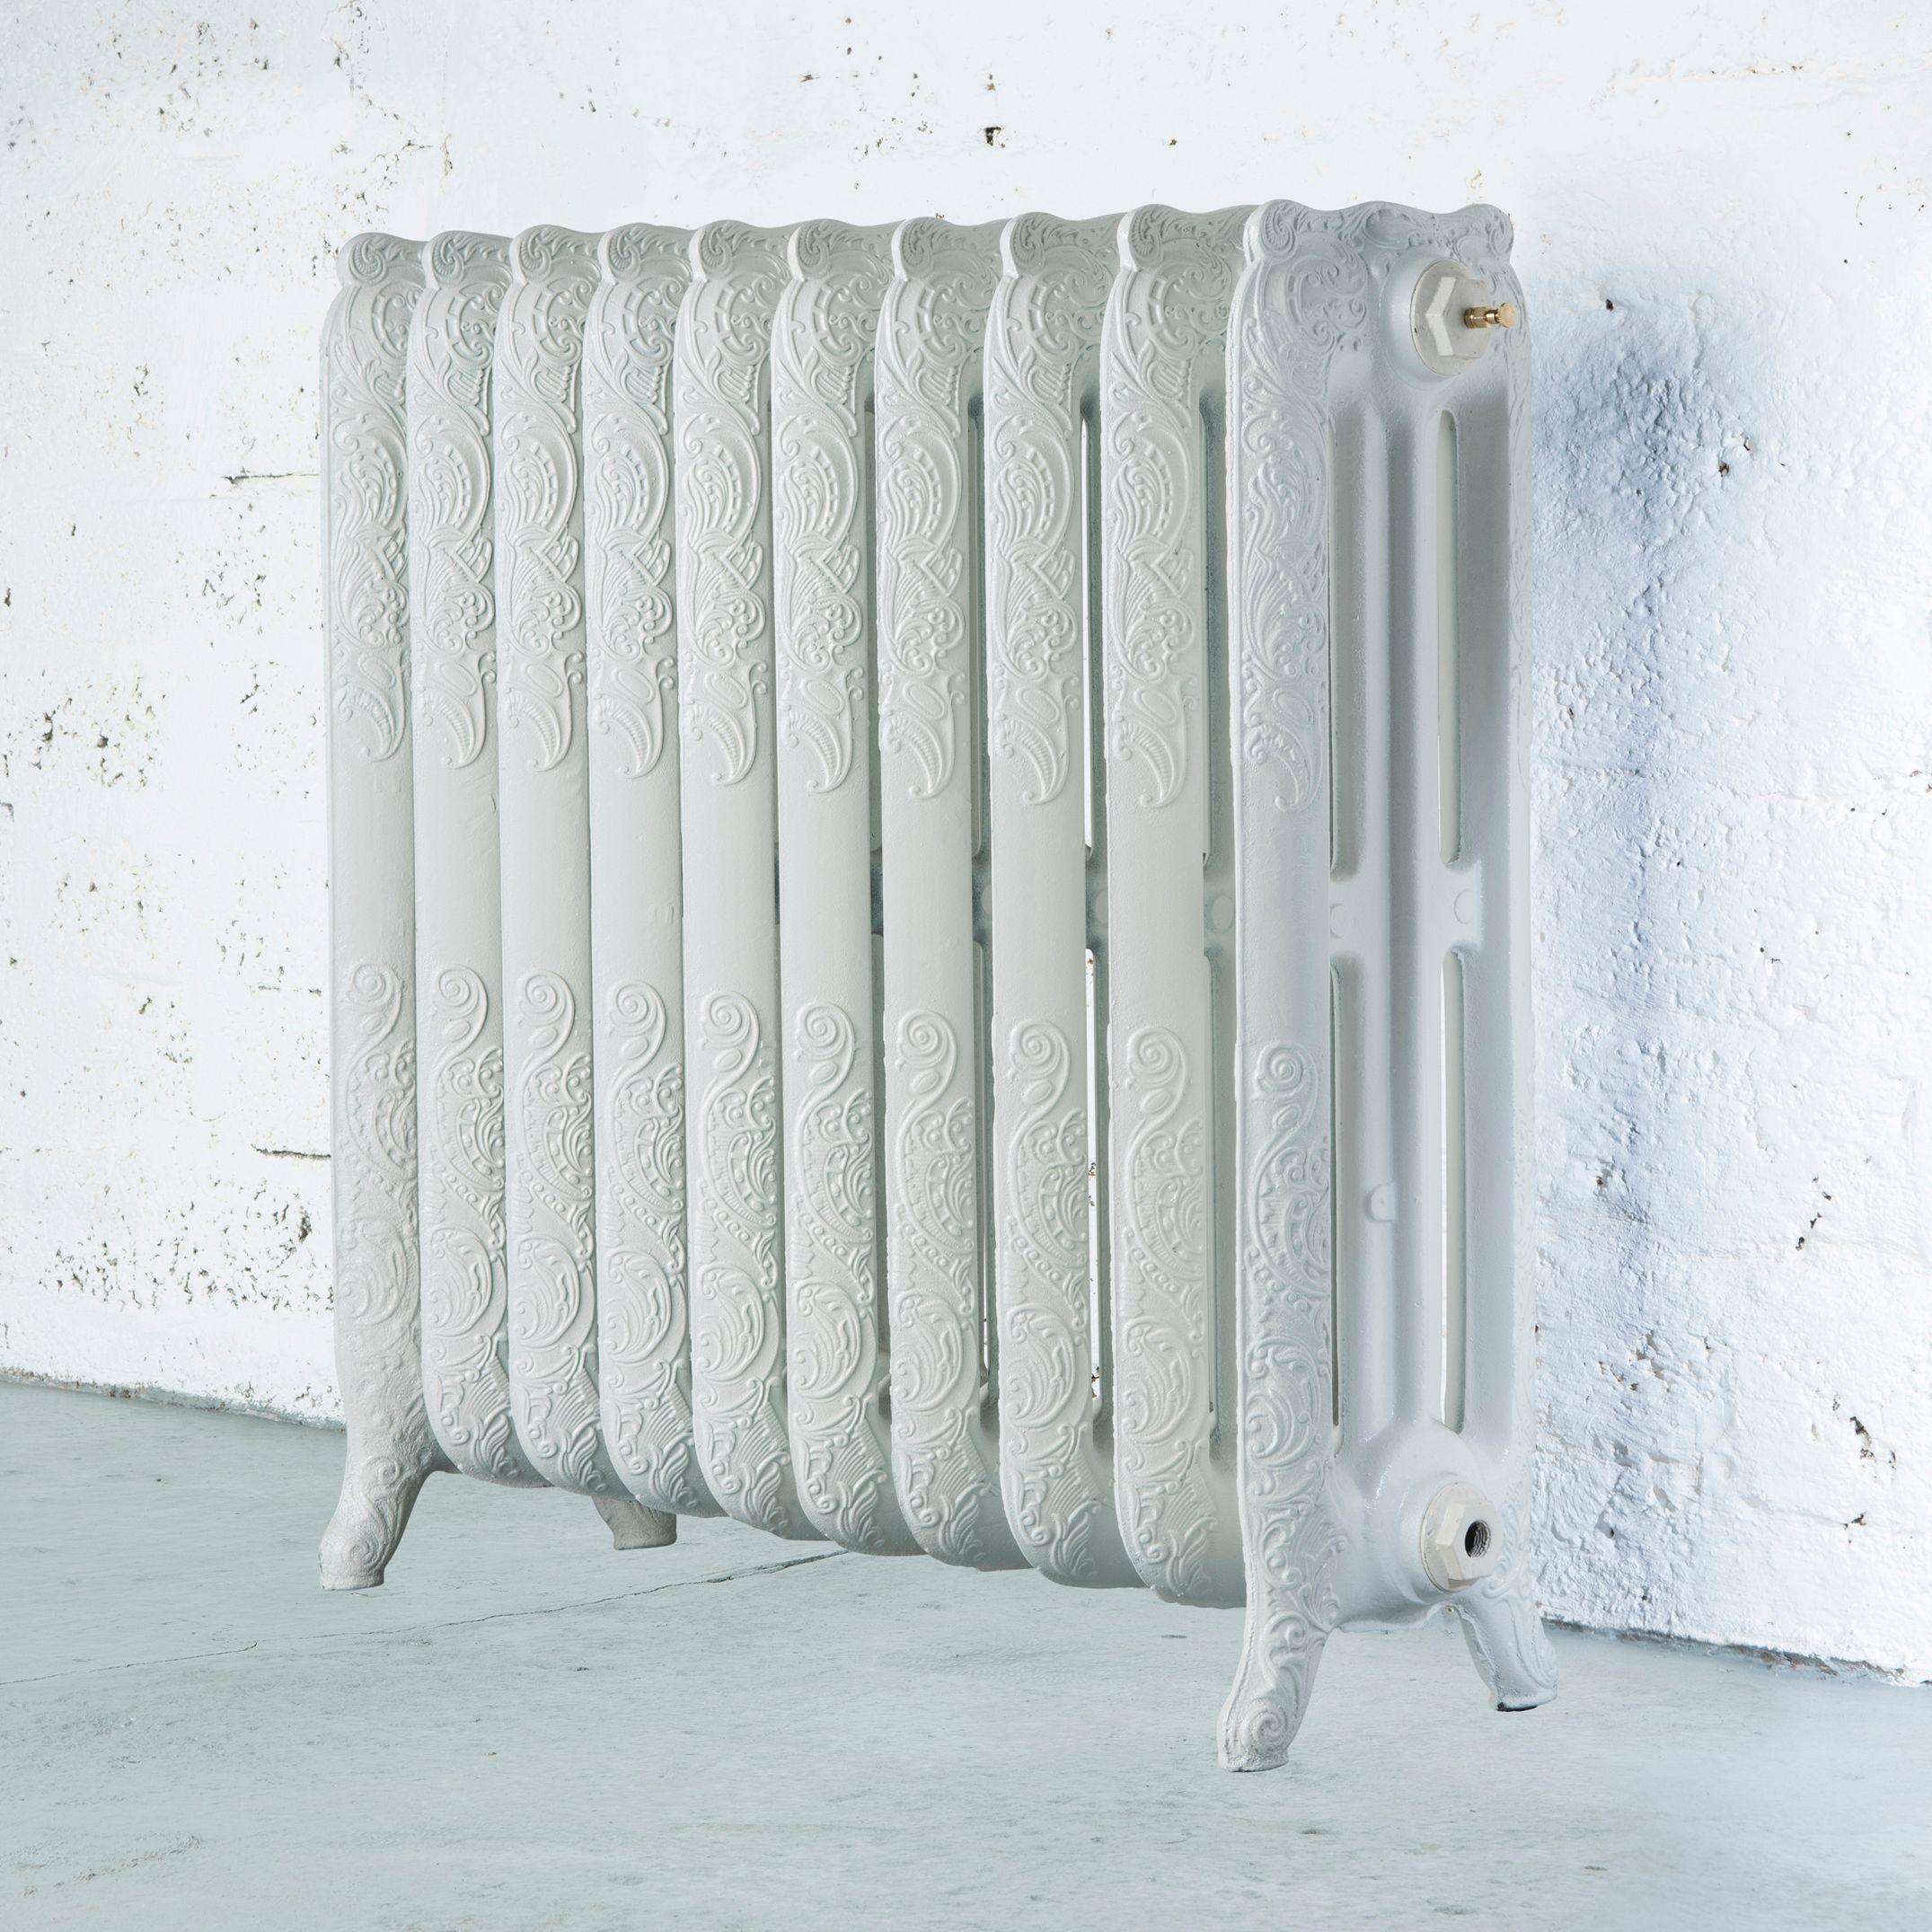 Arroll Montmartre 3 Column radiator, White (W)834mm (H)760mm